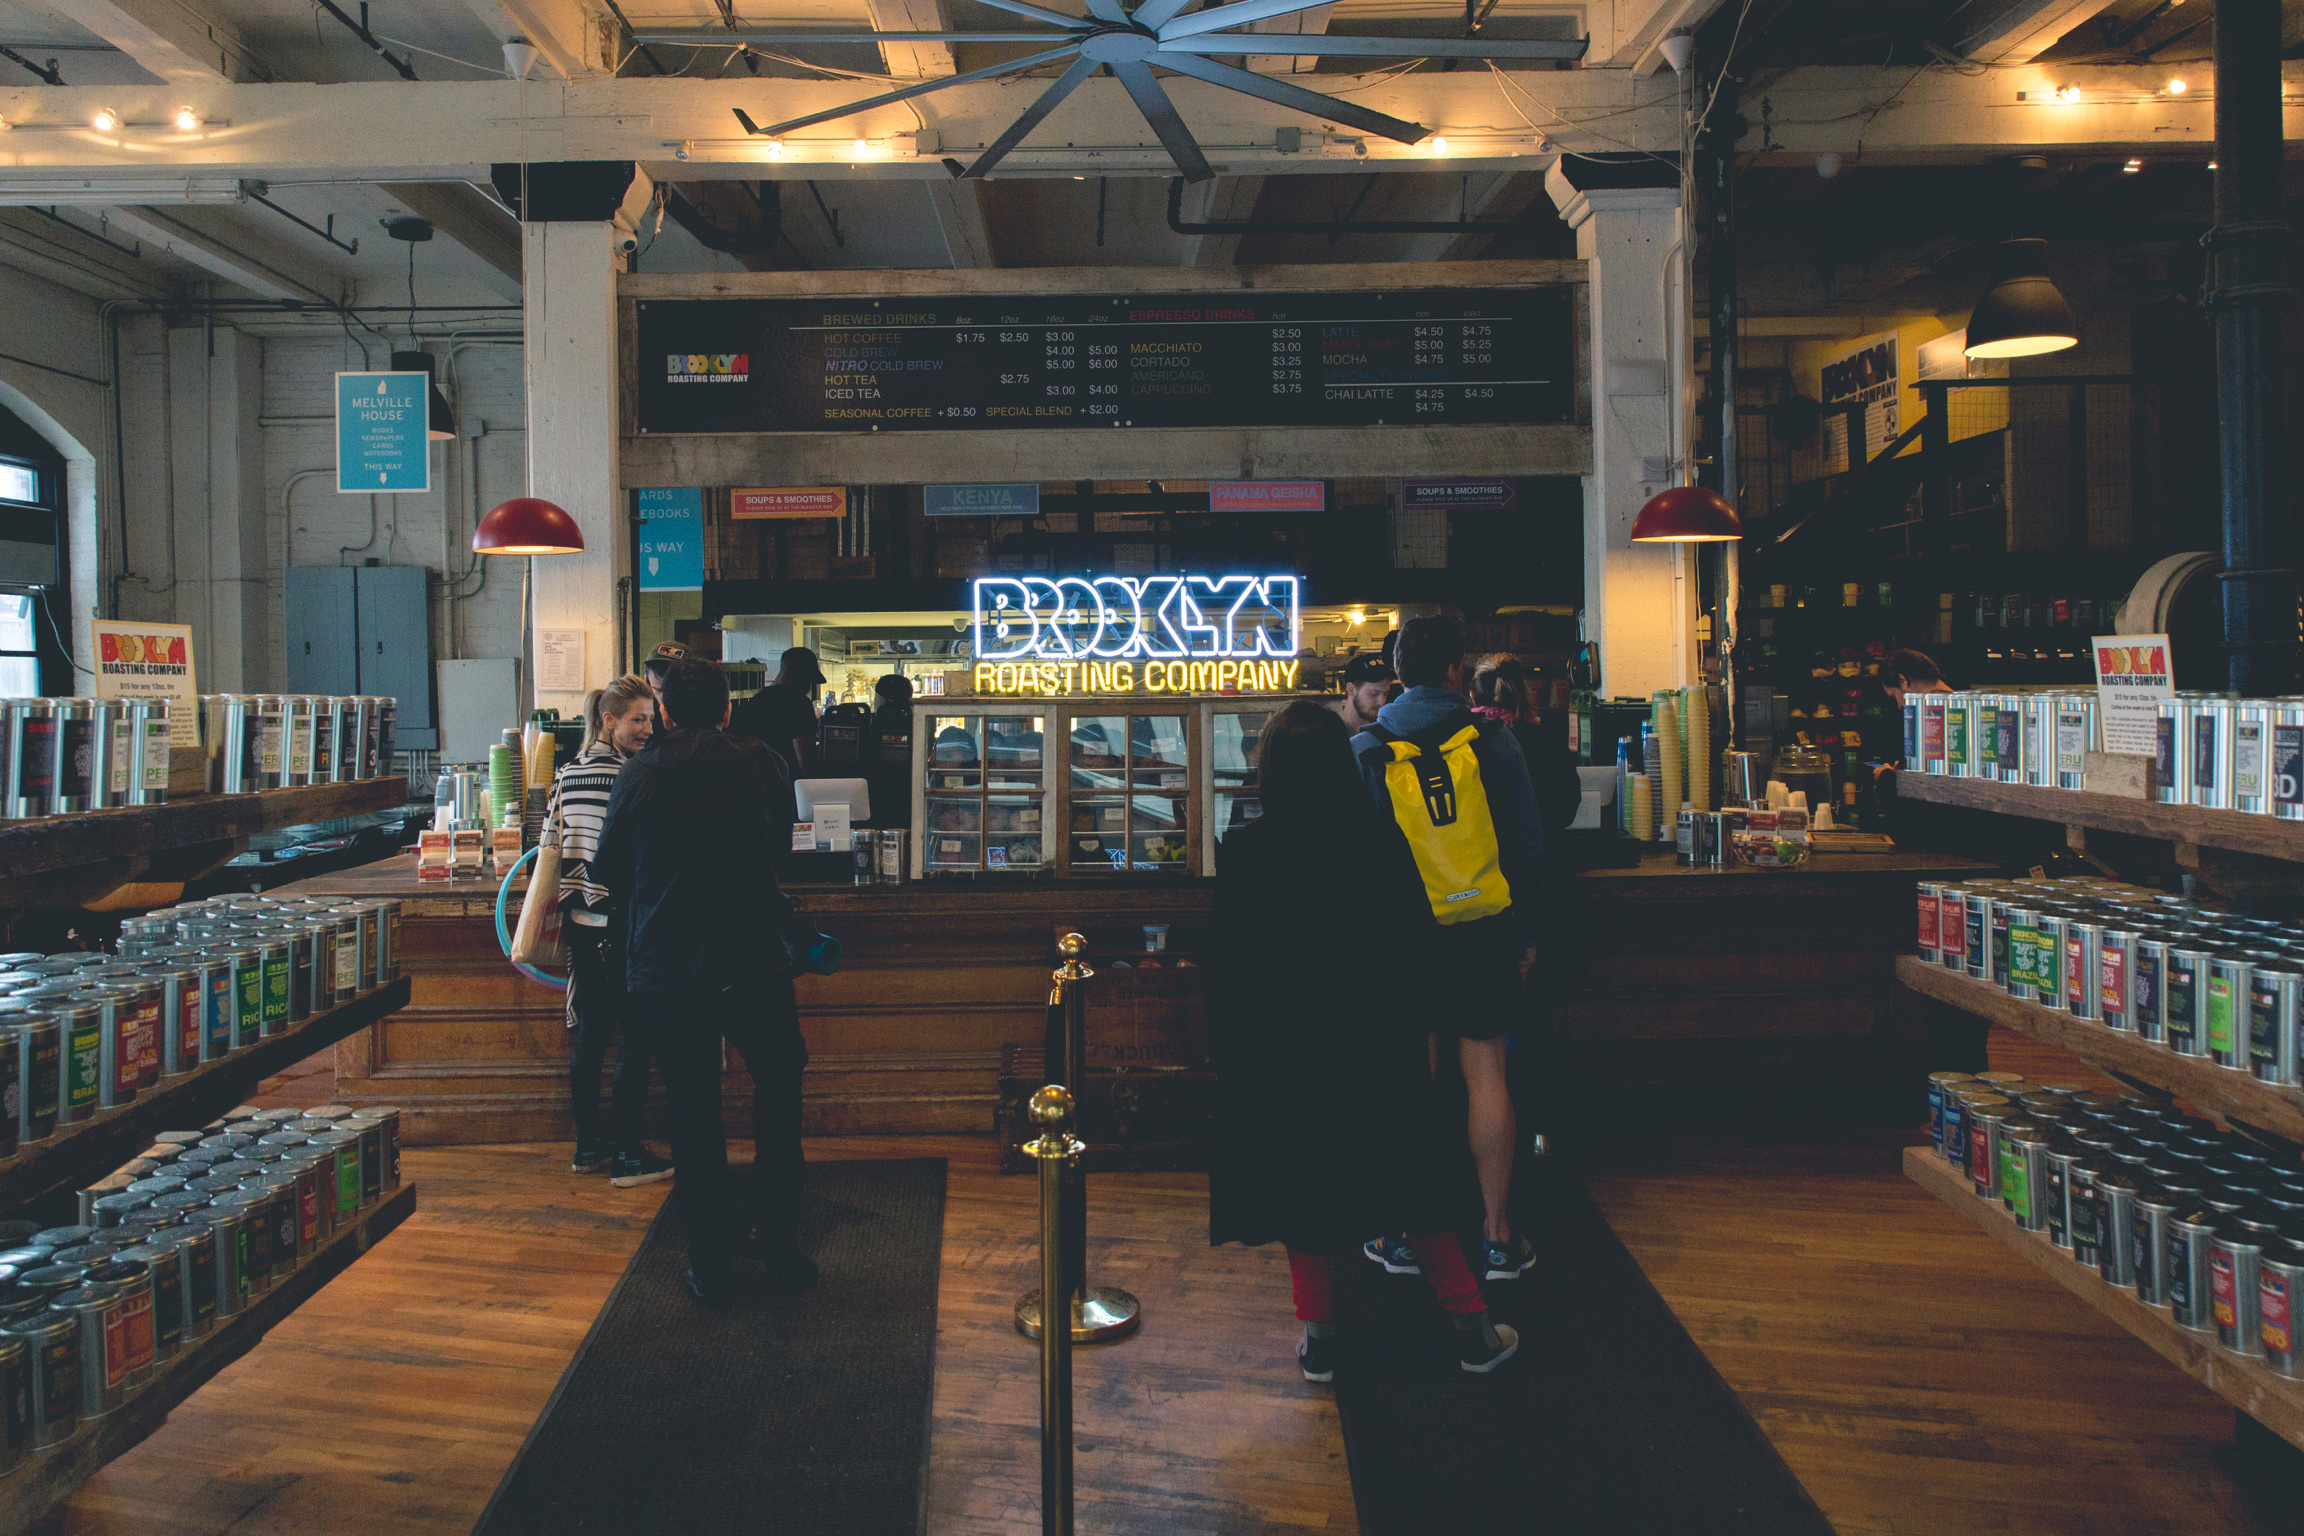 Brooklyn Roasting Company in DUMBO, New York City